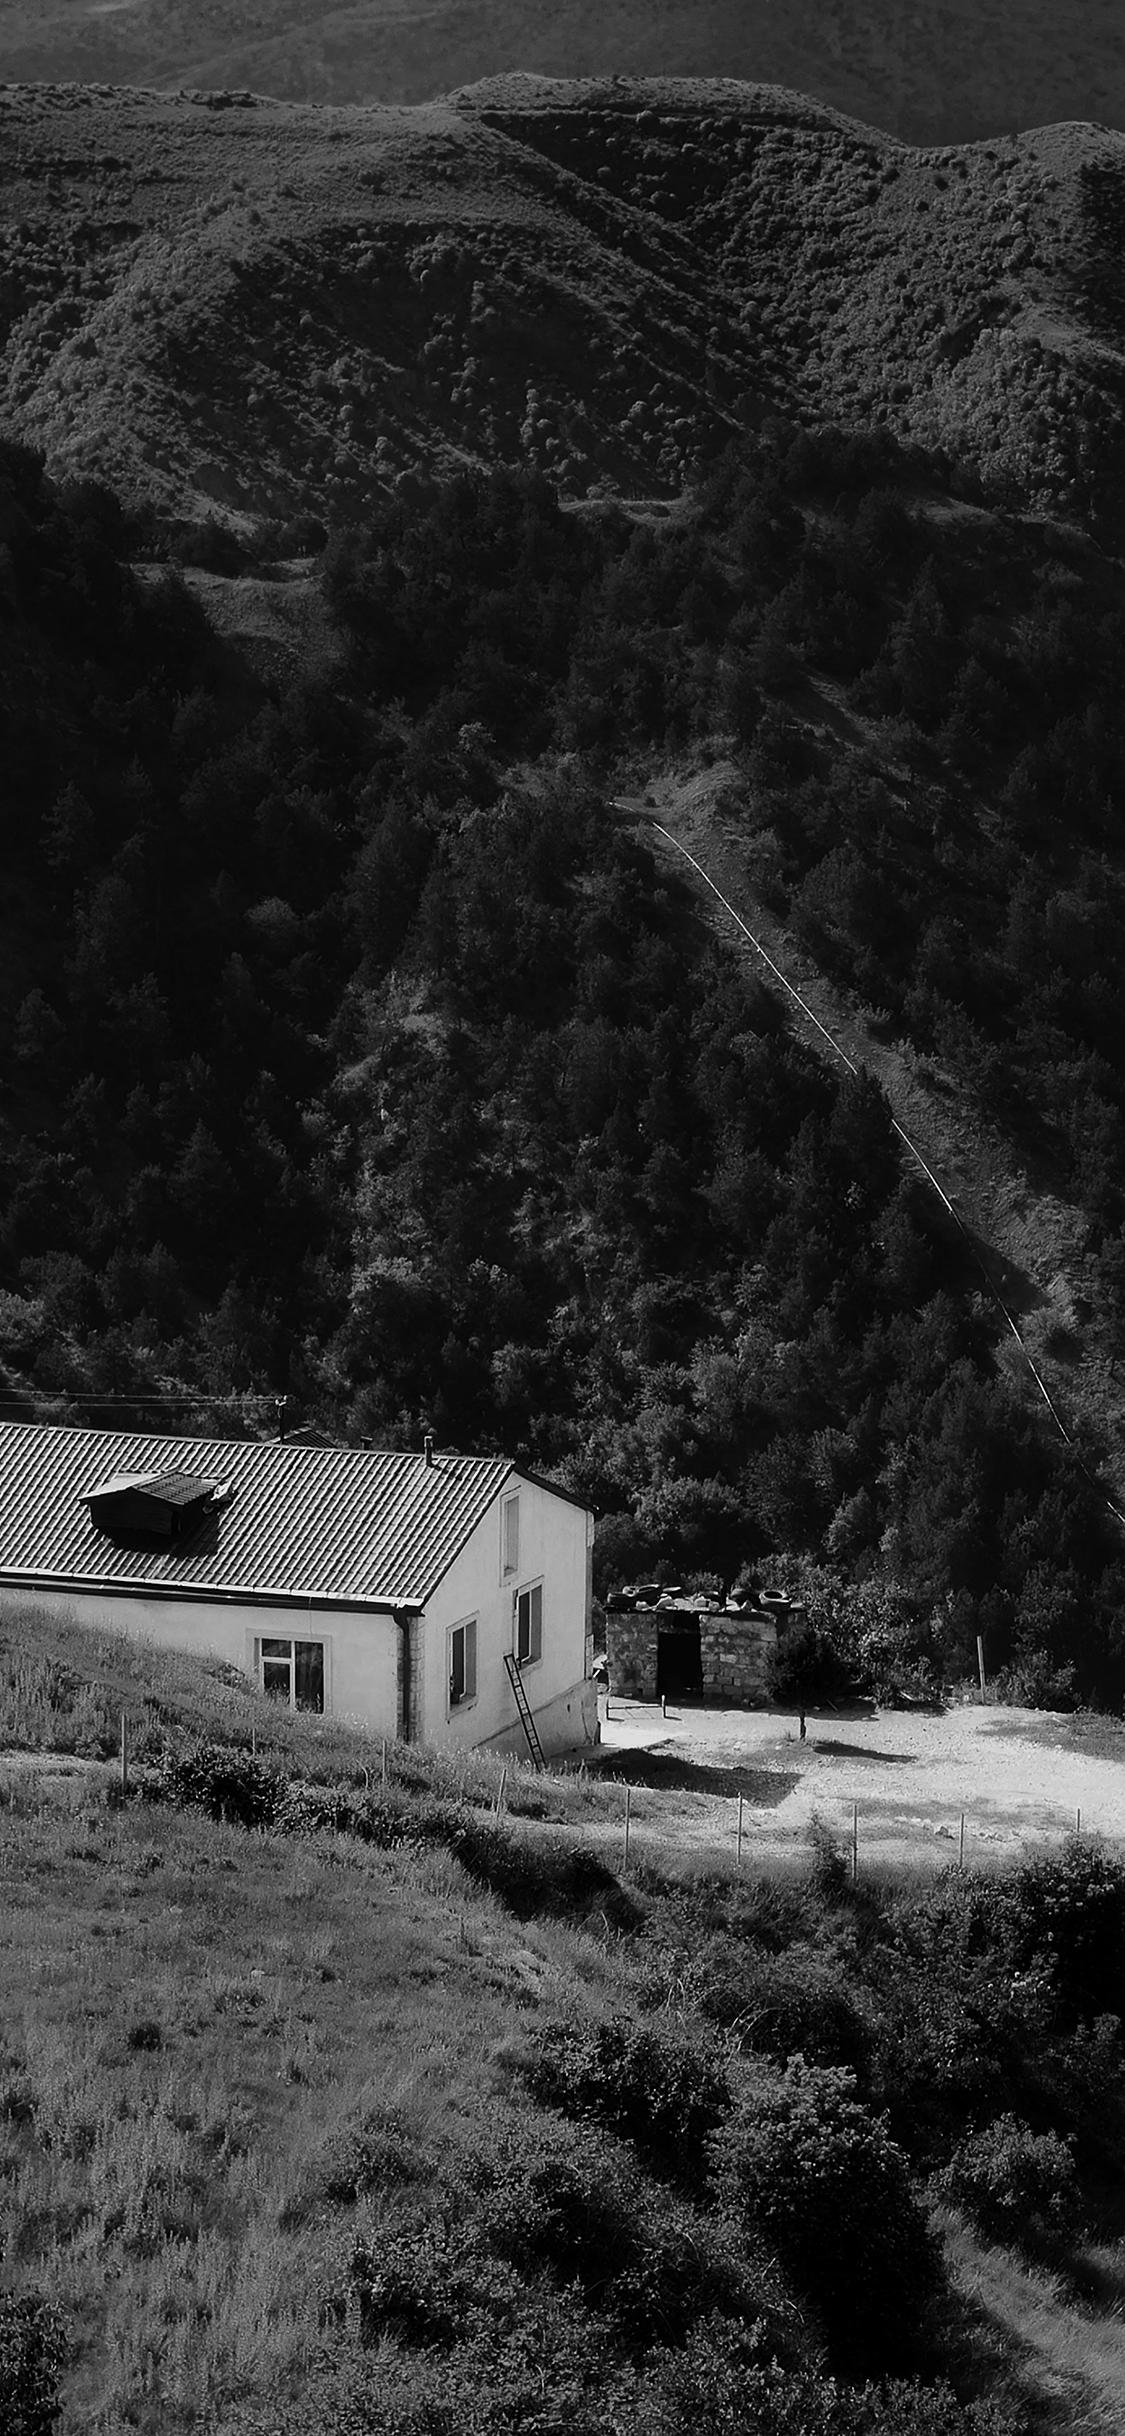 iPhonexpapers.com-Apple-iPhone-wallpaper-mh16-karabakh-armenia-black-nature-with-mountain-house-fall